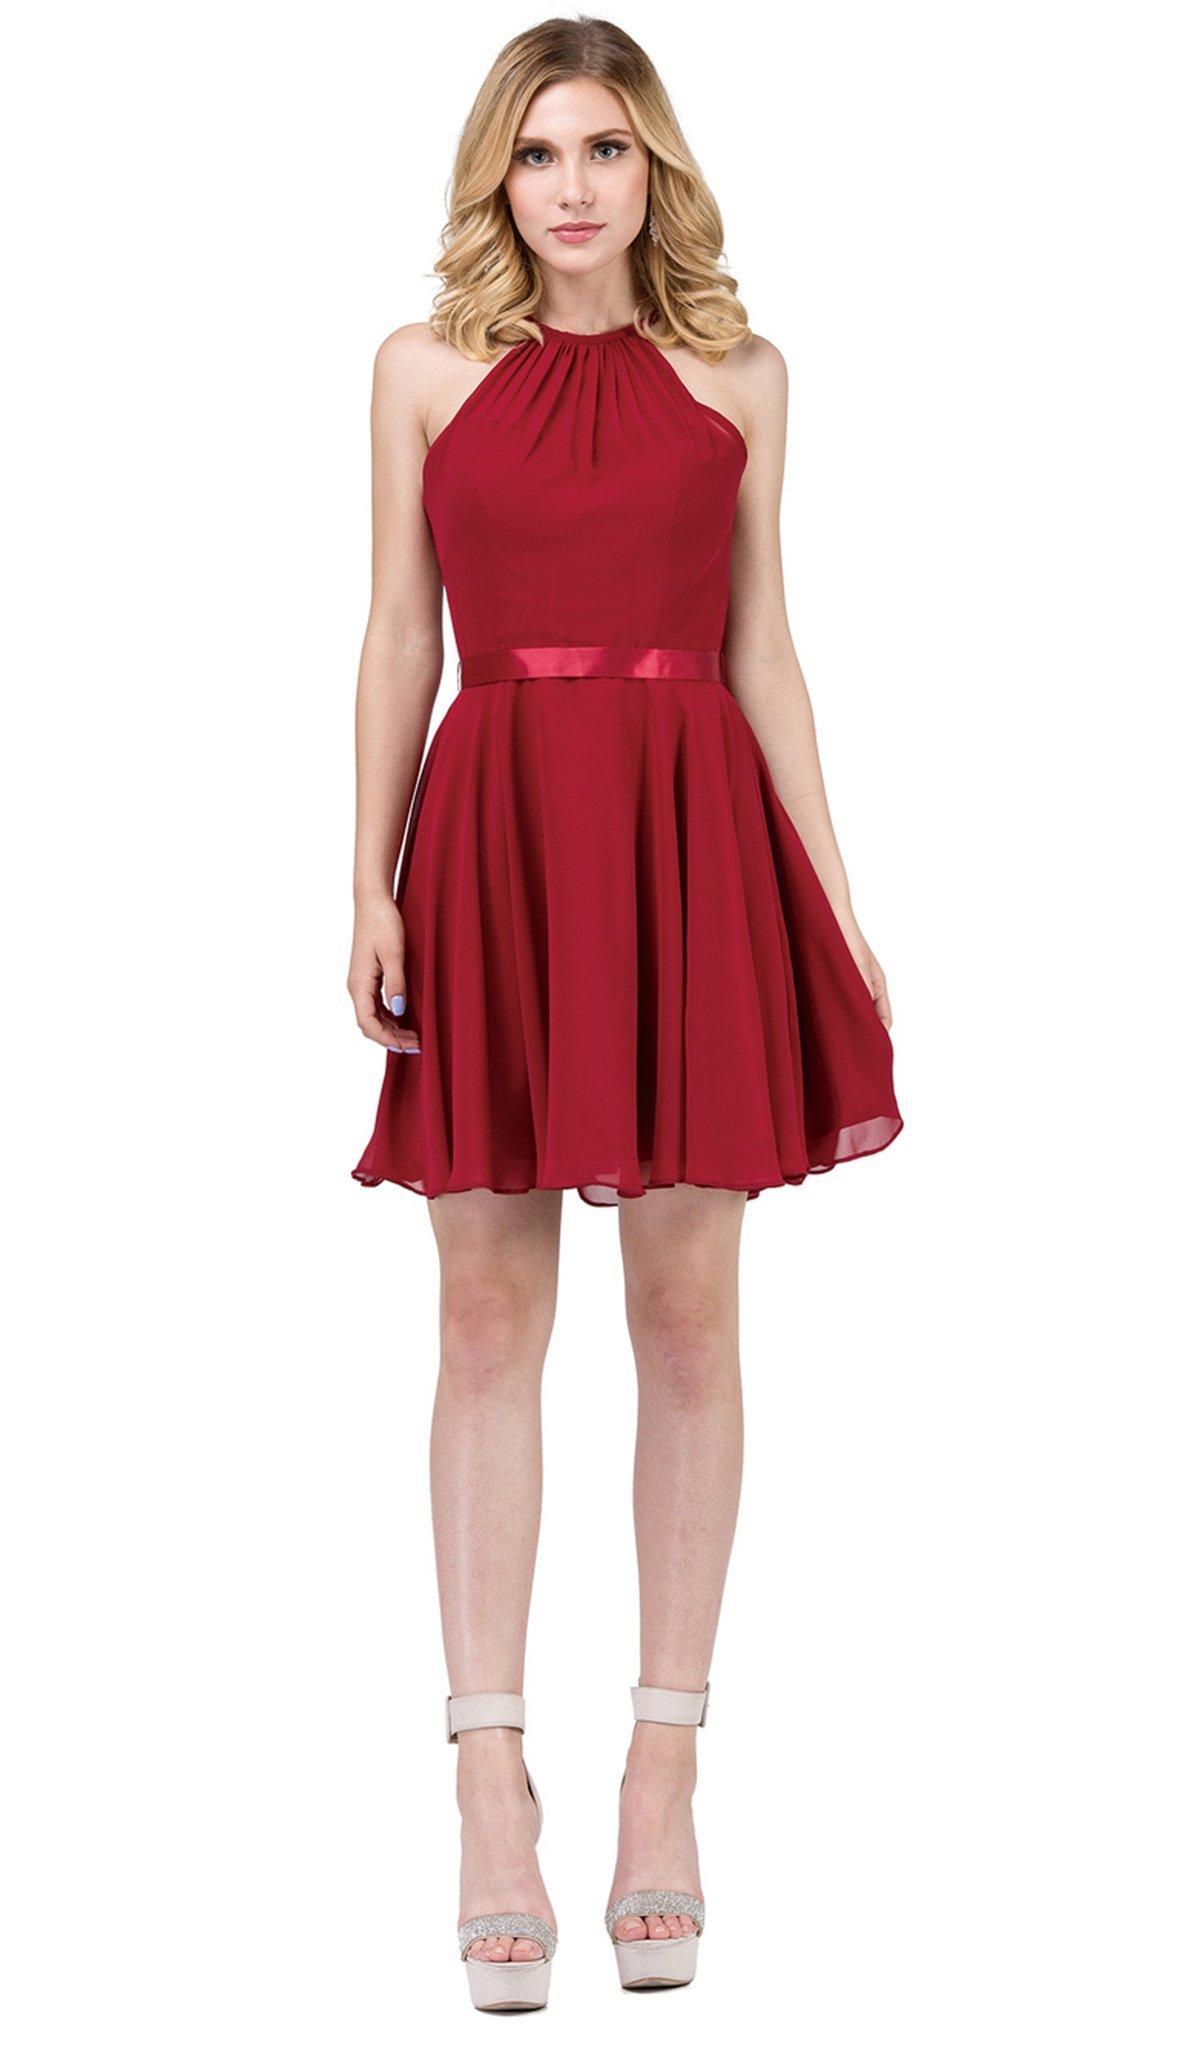 Dancing Queen - 3013 Halter Style Sleeveless Chiffon Cocktail Dress